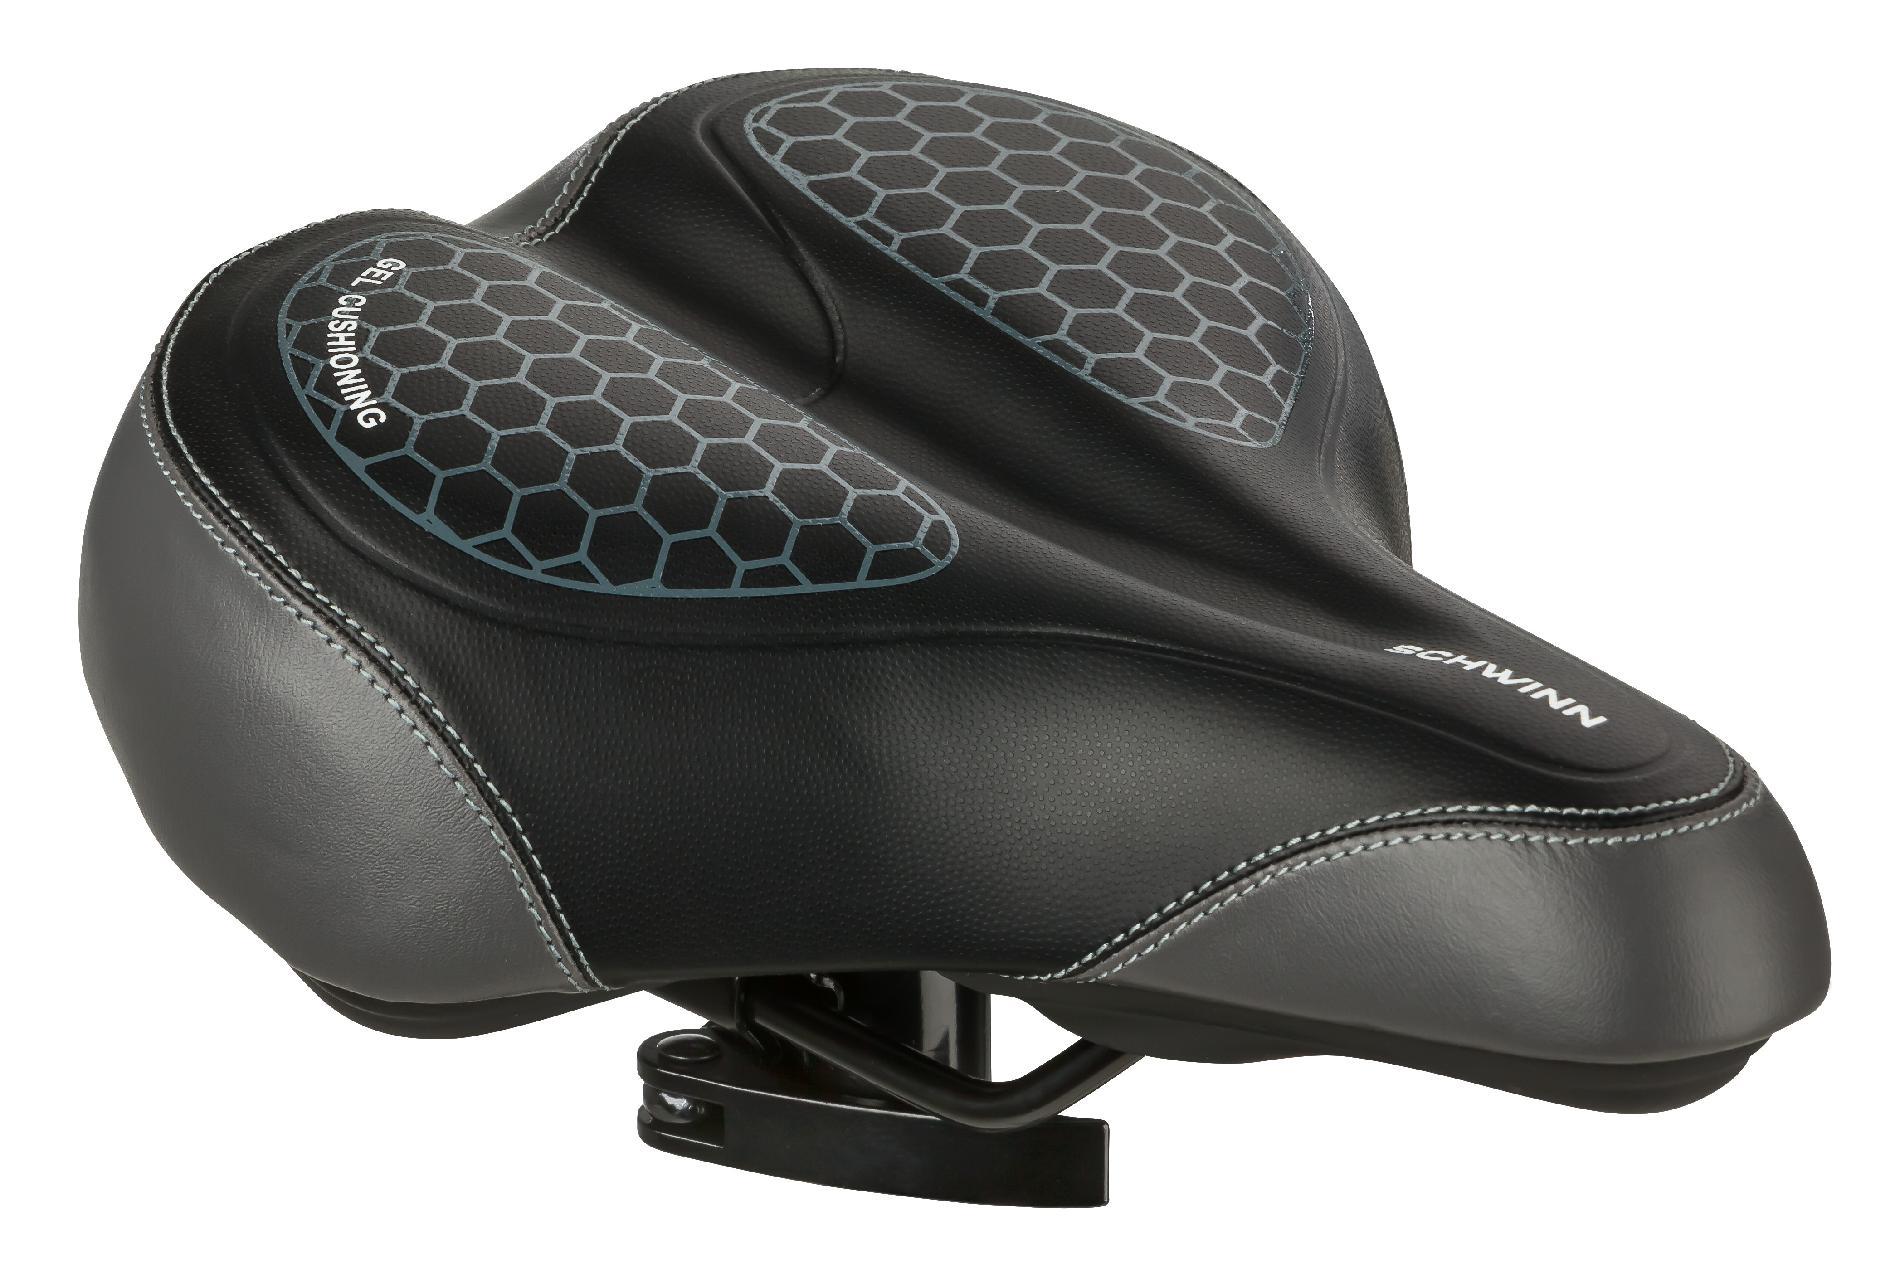 Schwinn Gel Saddle Bike Seat  Fitness  Sports  Wheeled